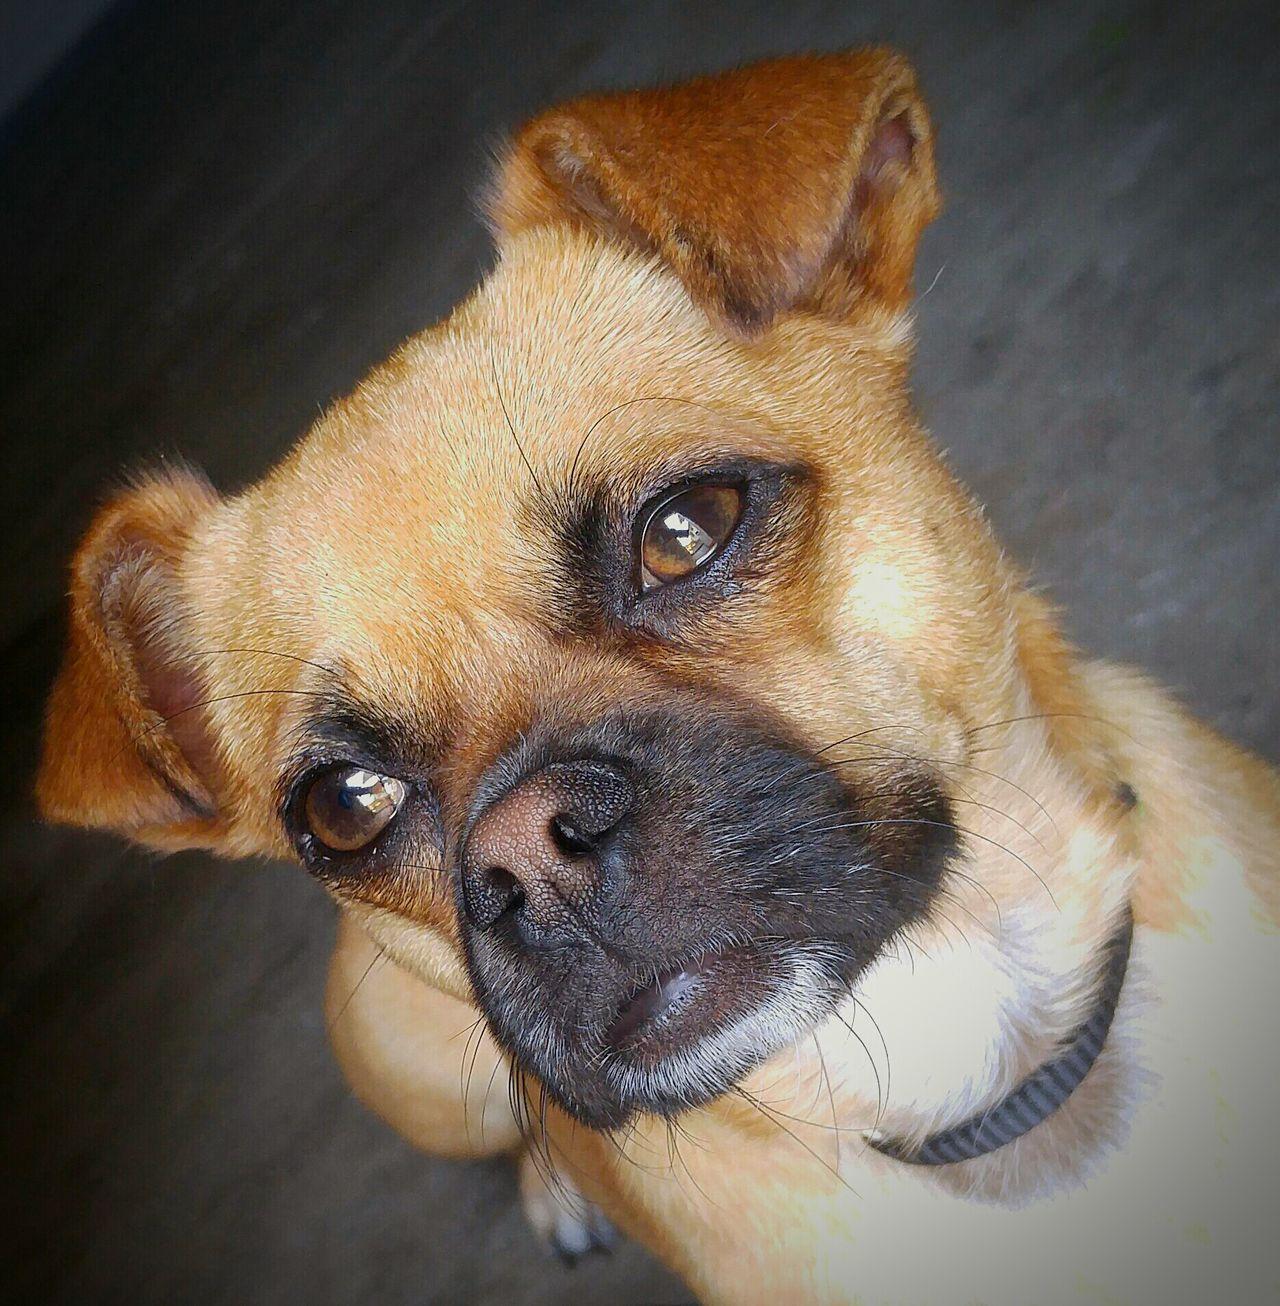 """Yoda"" the Chug Chug Chihuahua Pug Chihuahuamix Pugmix Dog Puppy Pensive DeepThinking Doggie Watchful Seriousface"